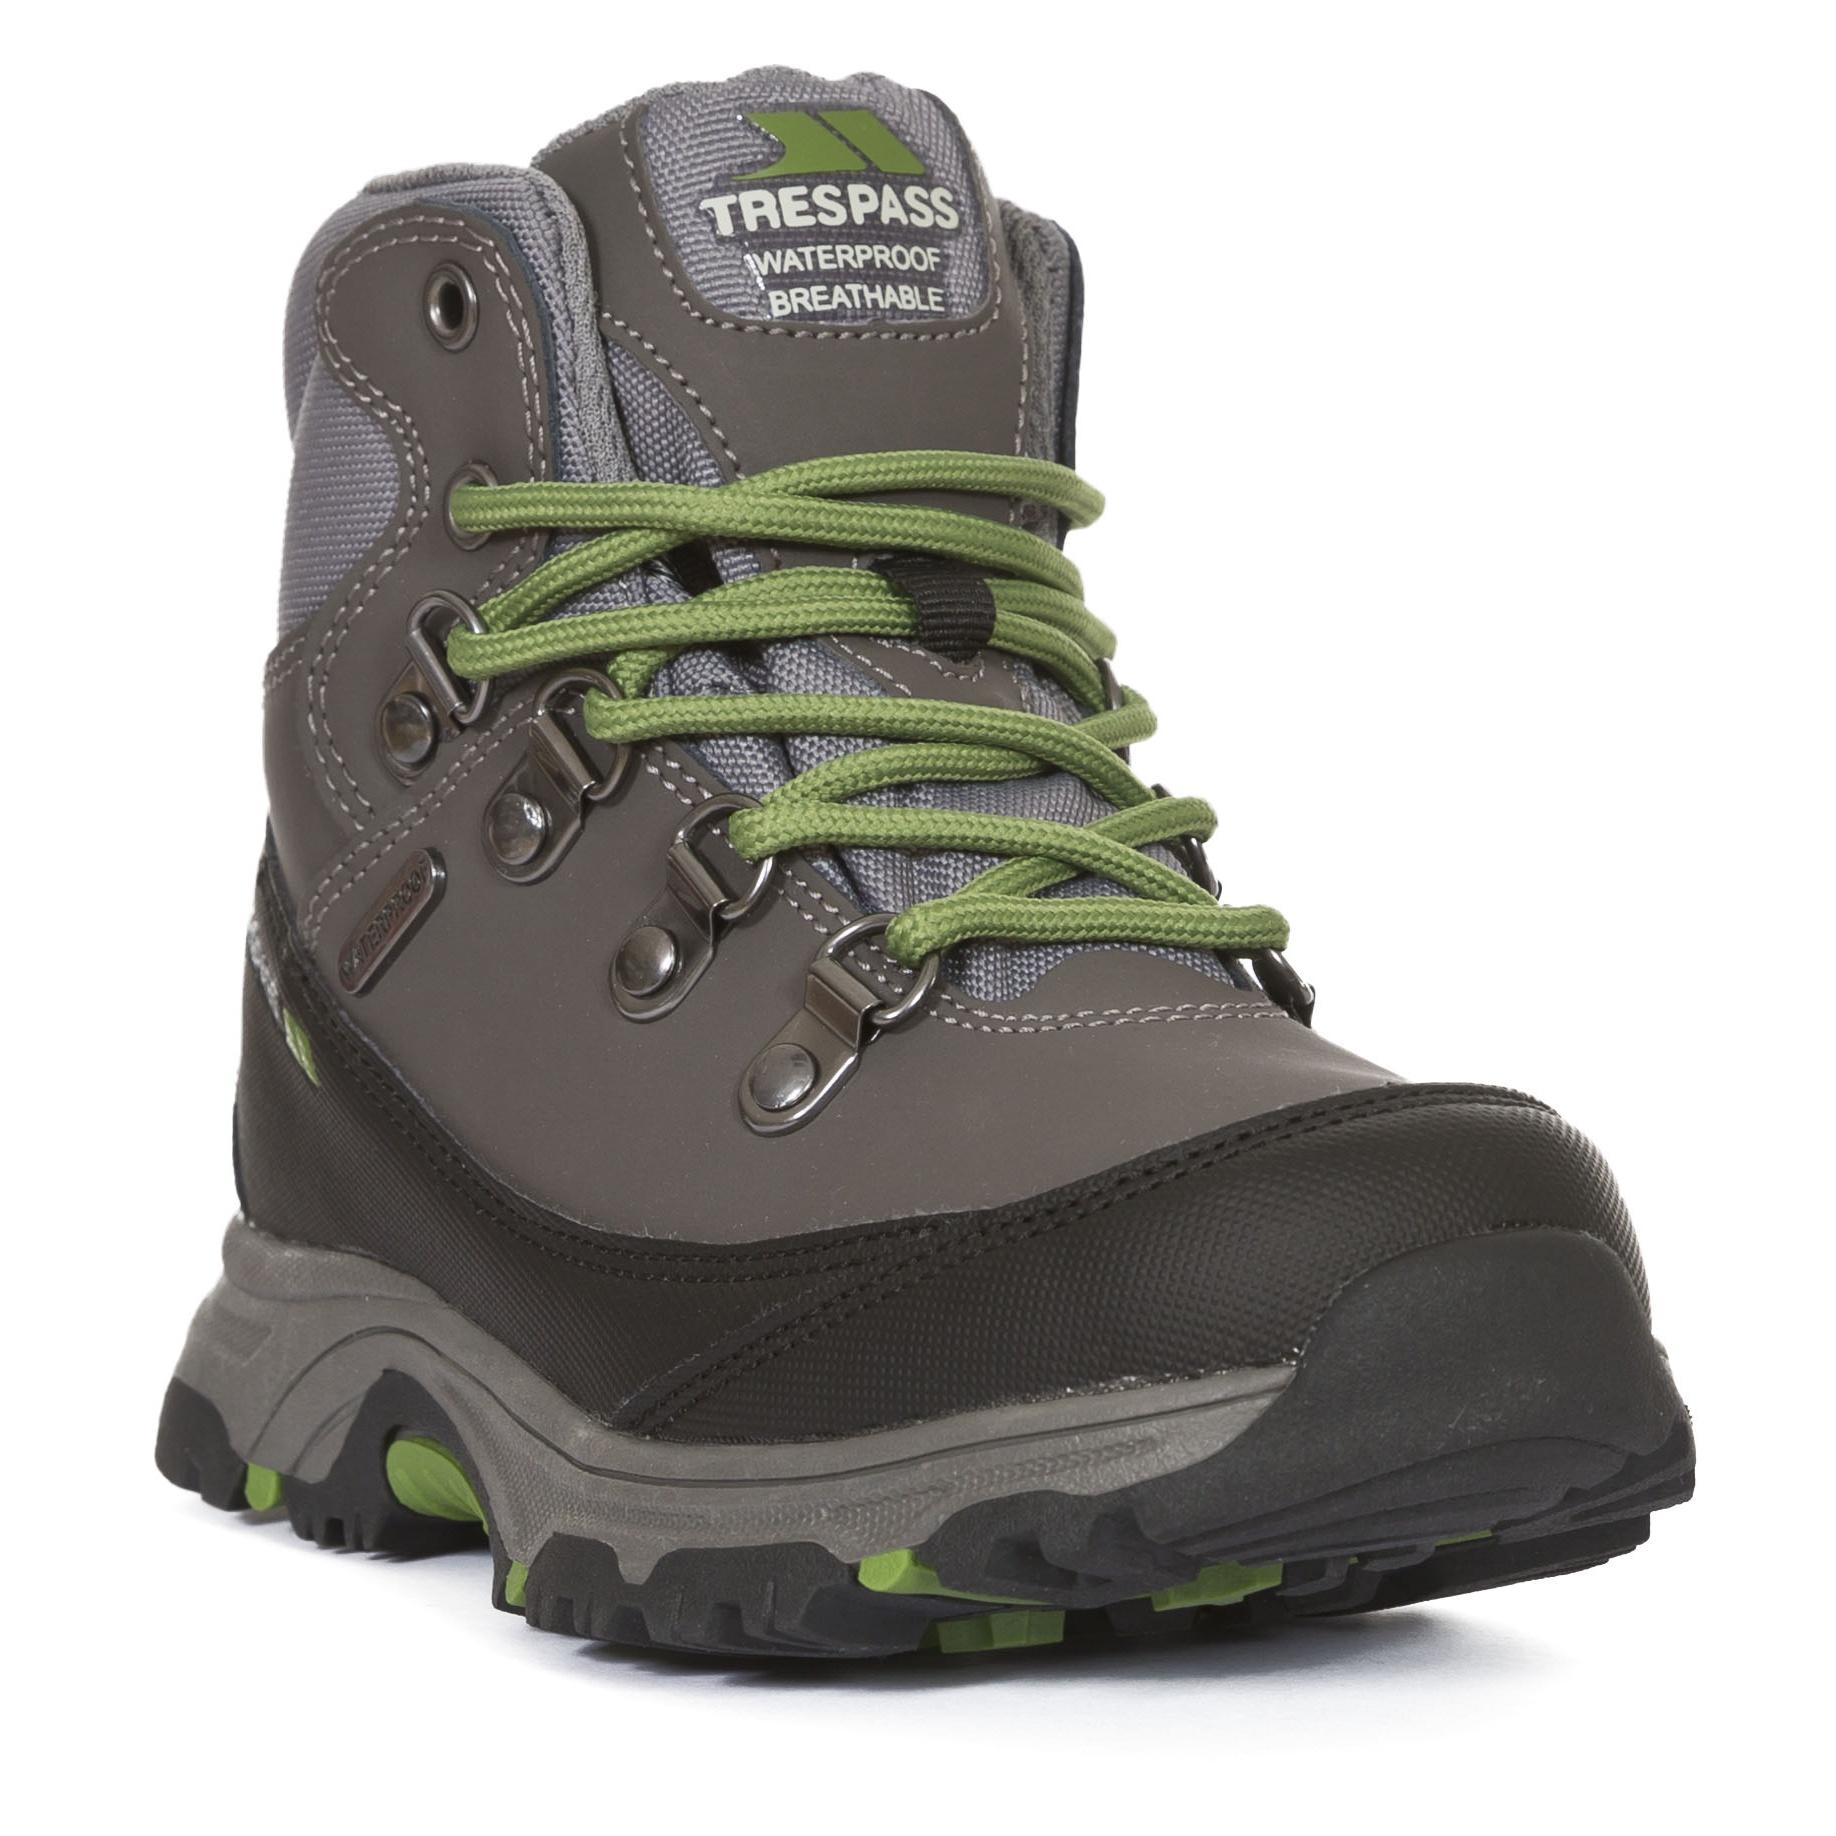 Trespass-Childrens-Kids-Glebe-II-Waterproof-Walking-Boots-TP3290 thumbnail 10